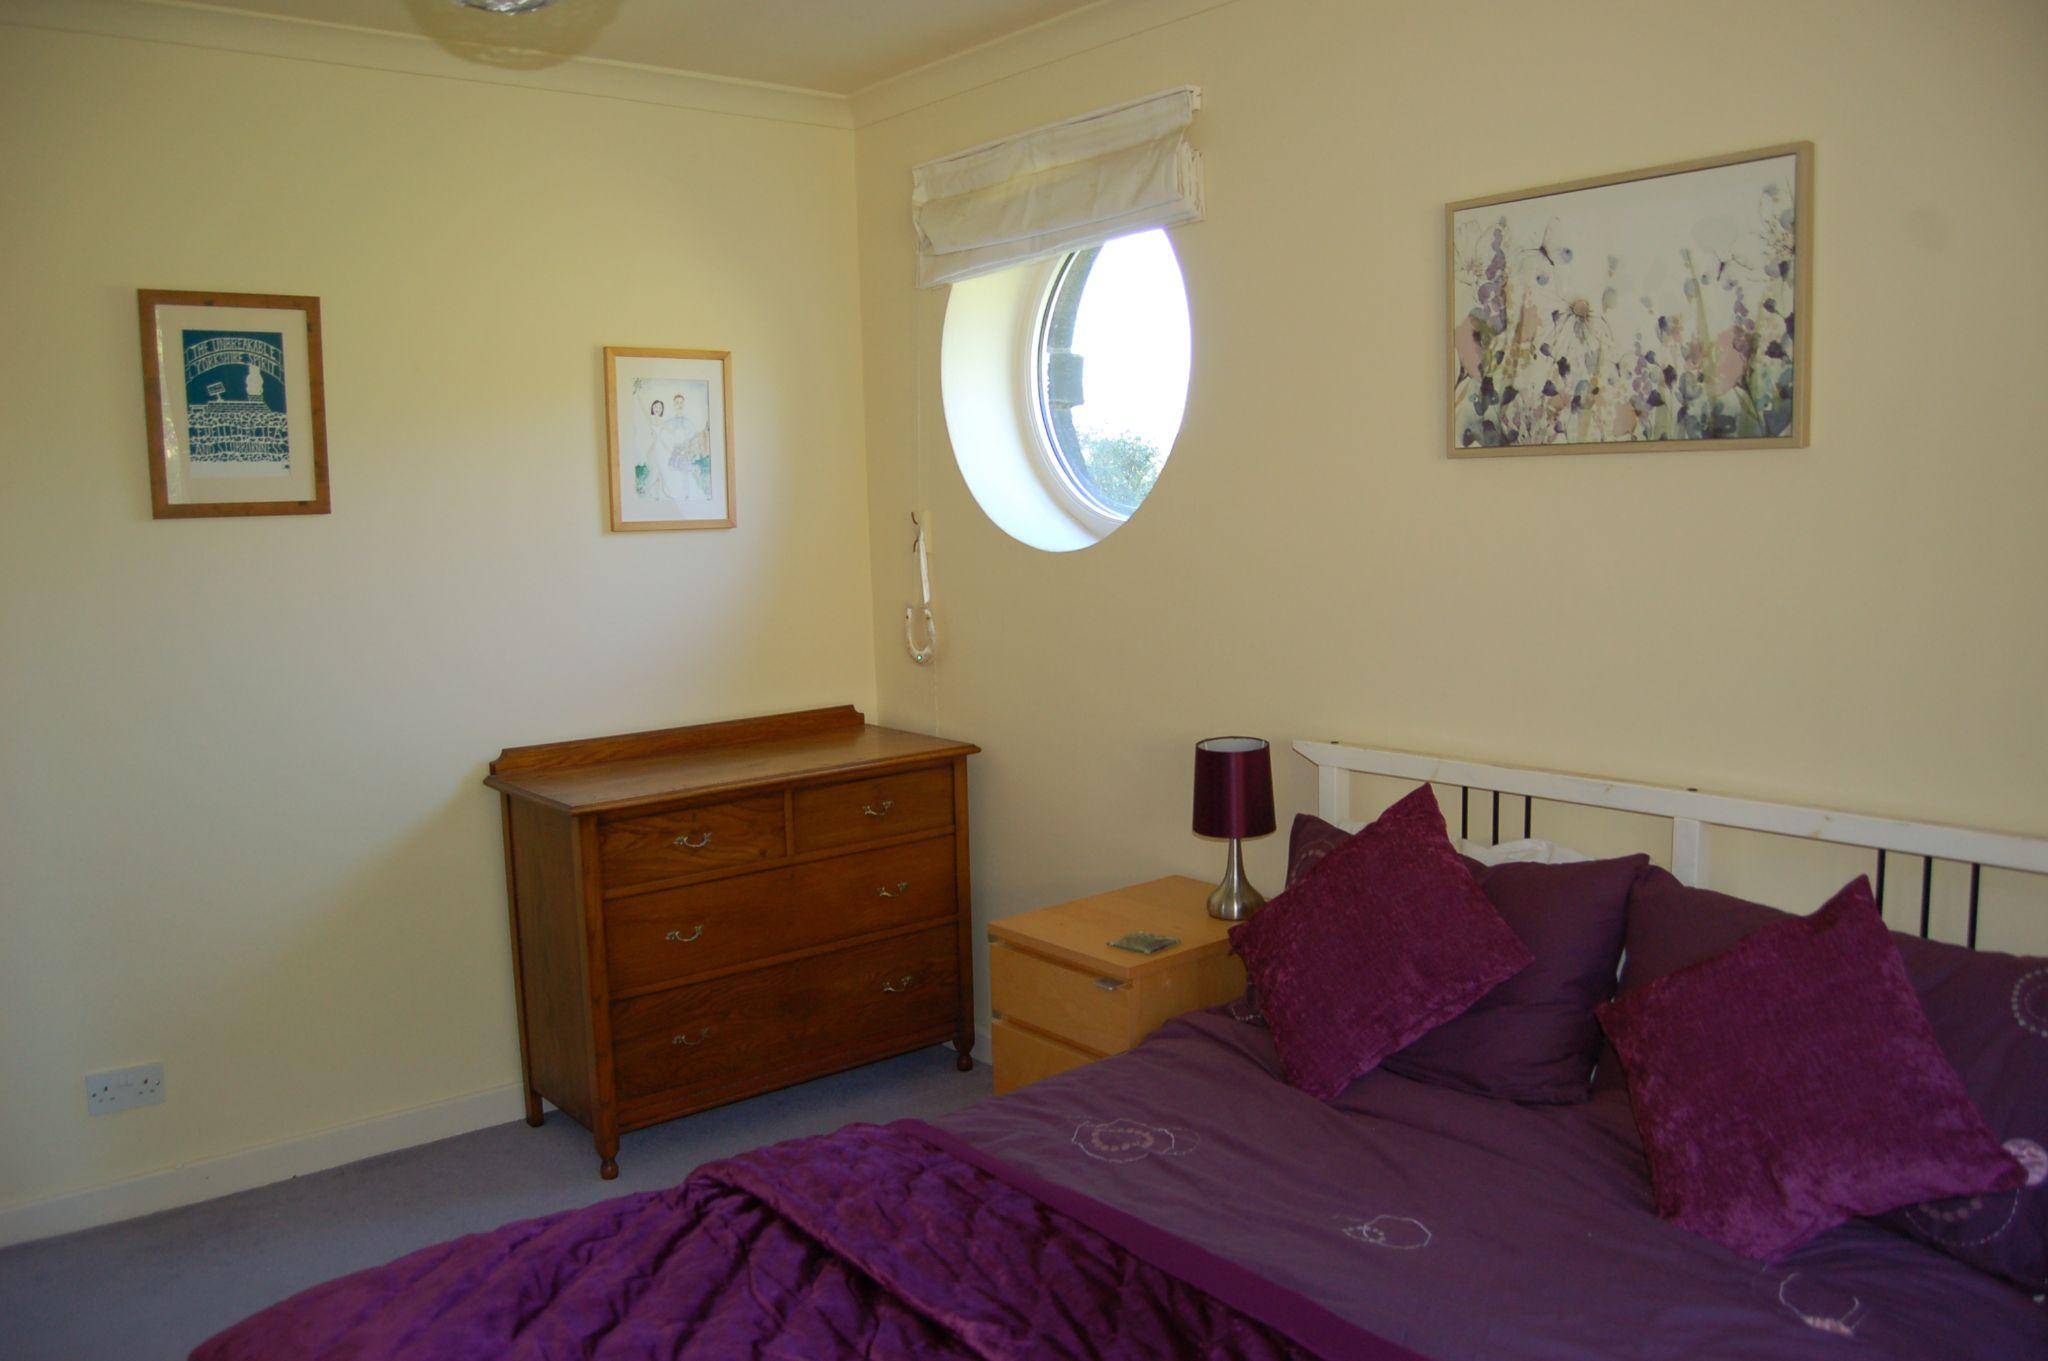 5 bedroom barn conversion house SSTC in Hebden Bridge - Photograph 12